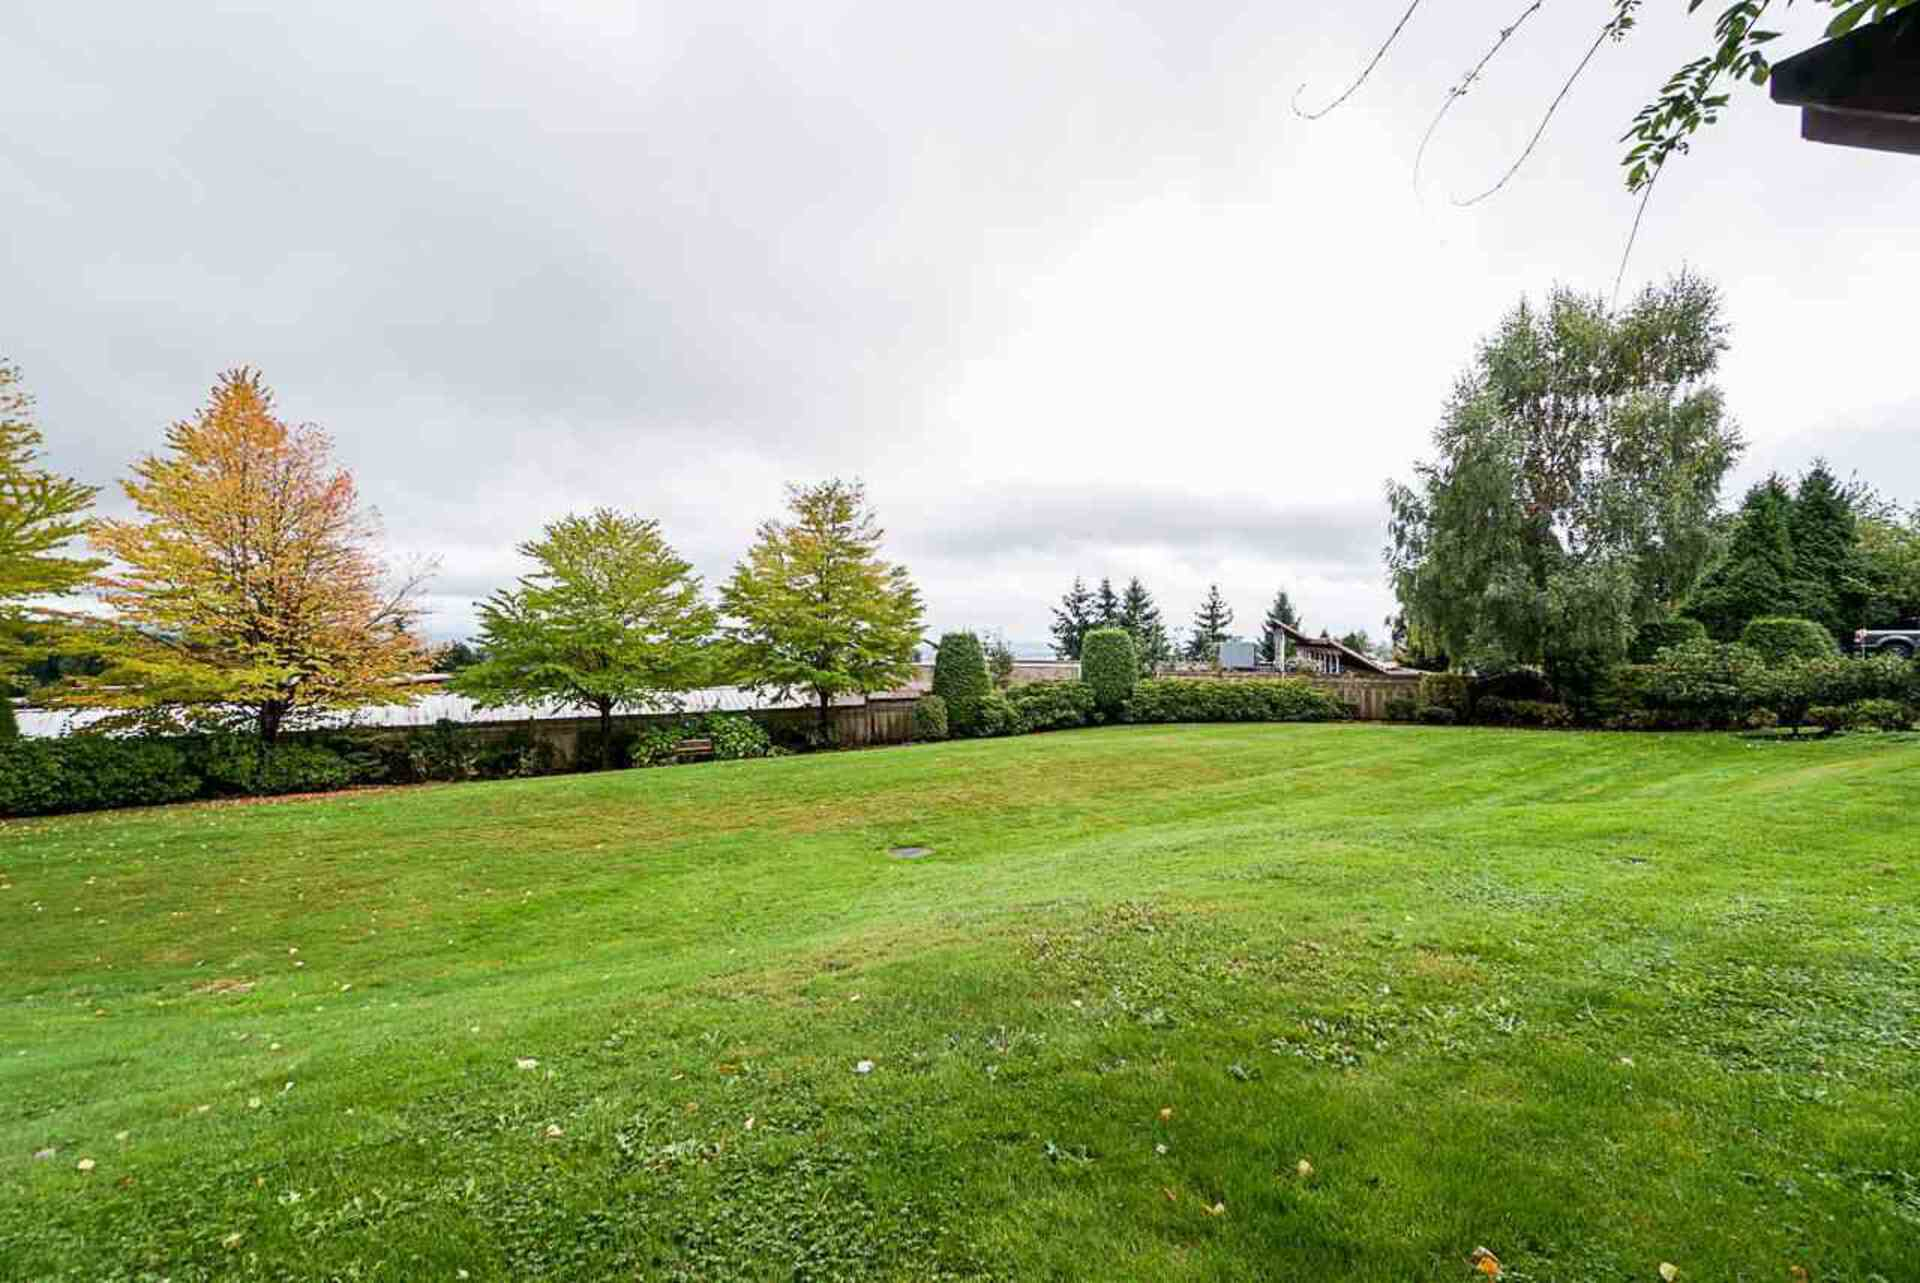 1438-parkway-boulevard-westwood-plateau-coquitlam-25 of 408 - 1438 Parkway Boulevard, Westwood Plateau, Coquitlam